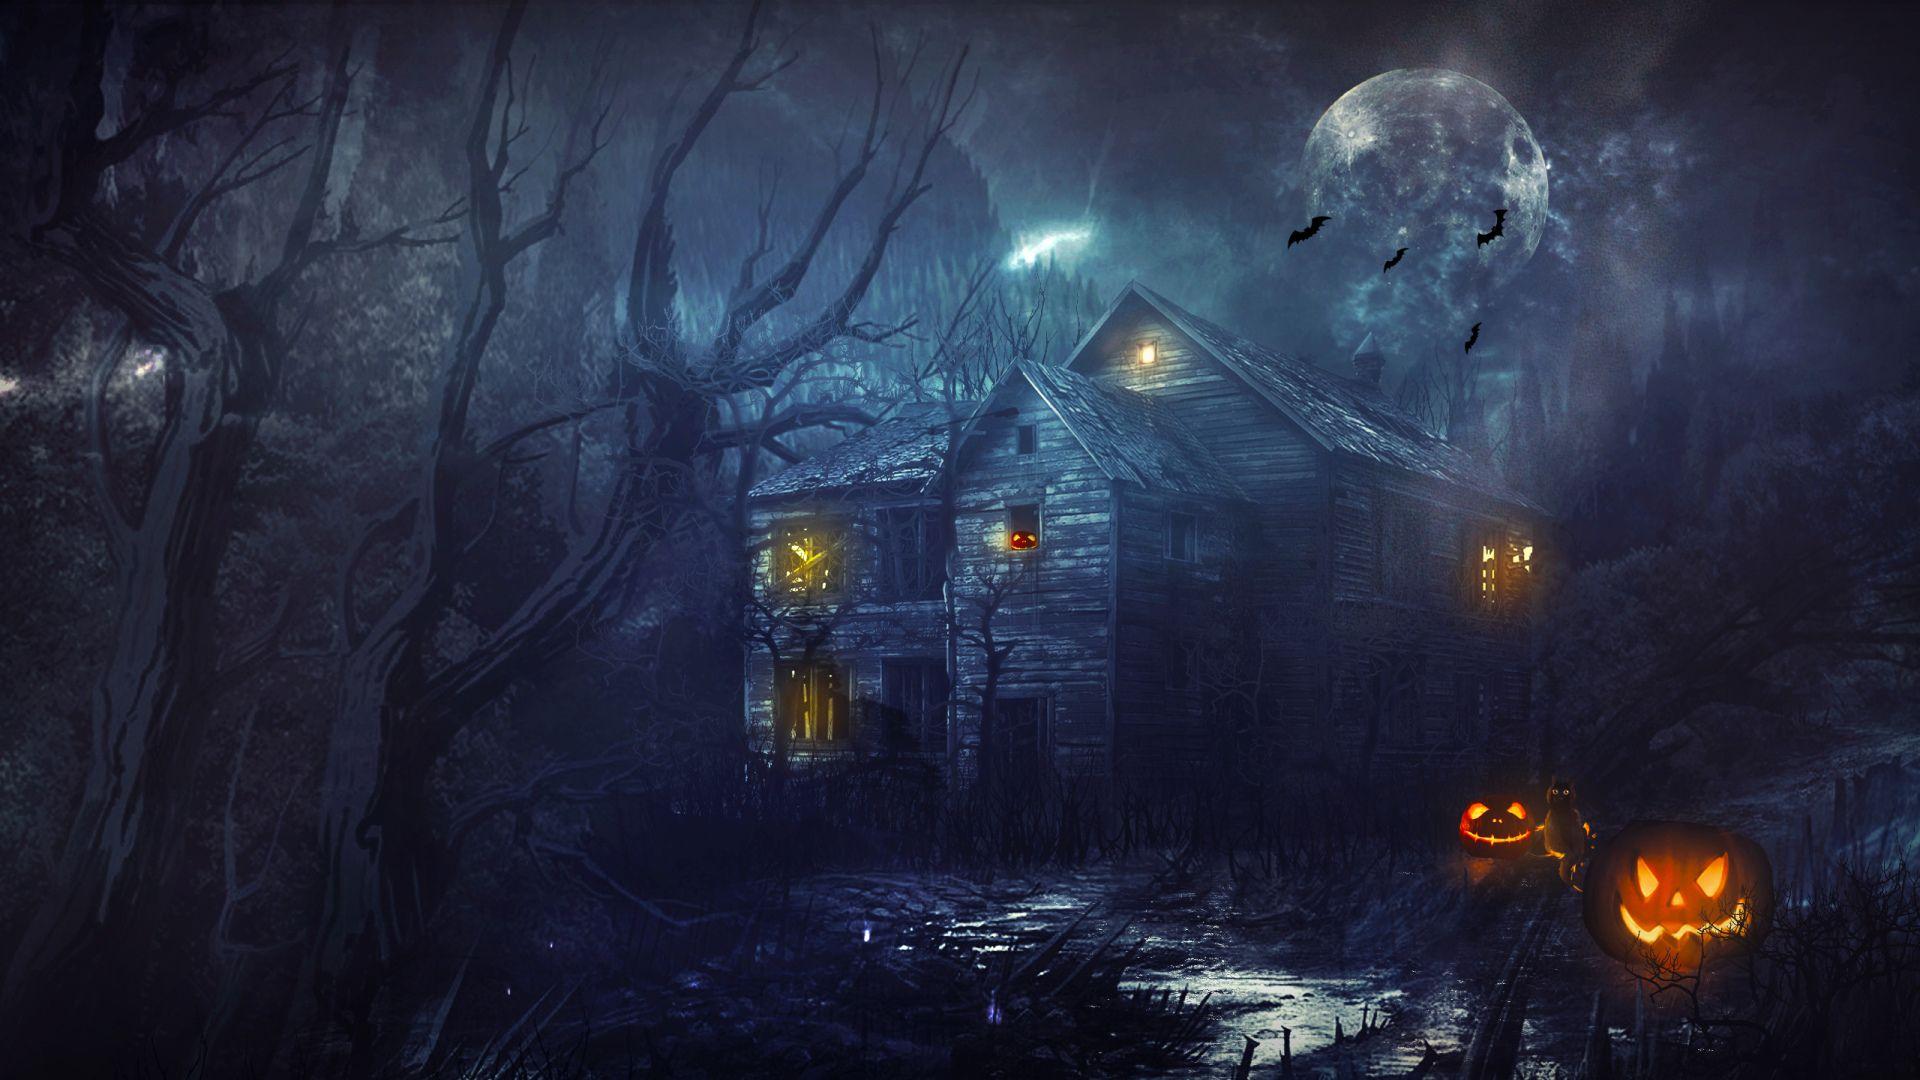 Vacances Halloween Vacances Haunted House Maison Night Effrayant Fond D Ecran Photo Halloween Maison Hantee Halloween Arriere Plans D Halloween